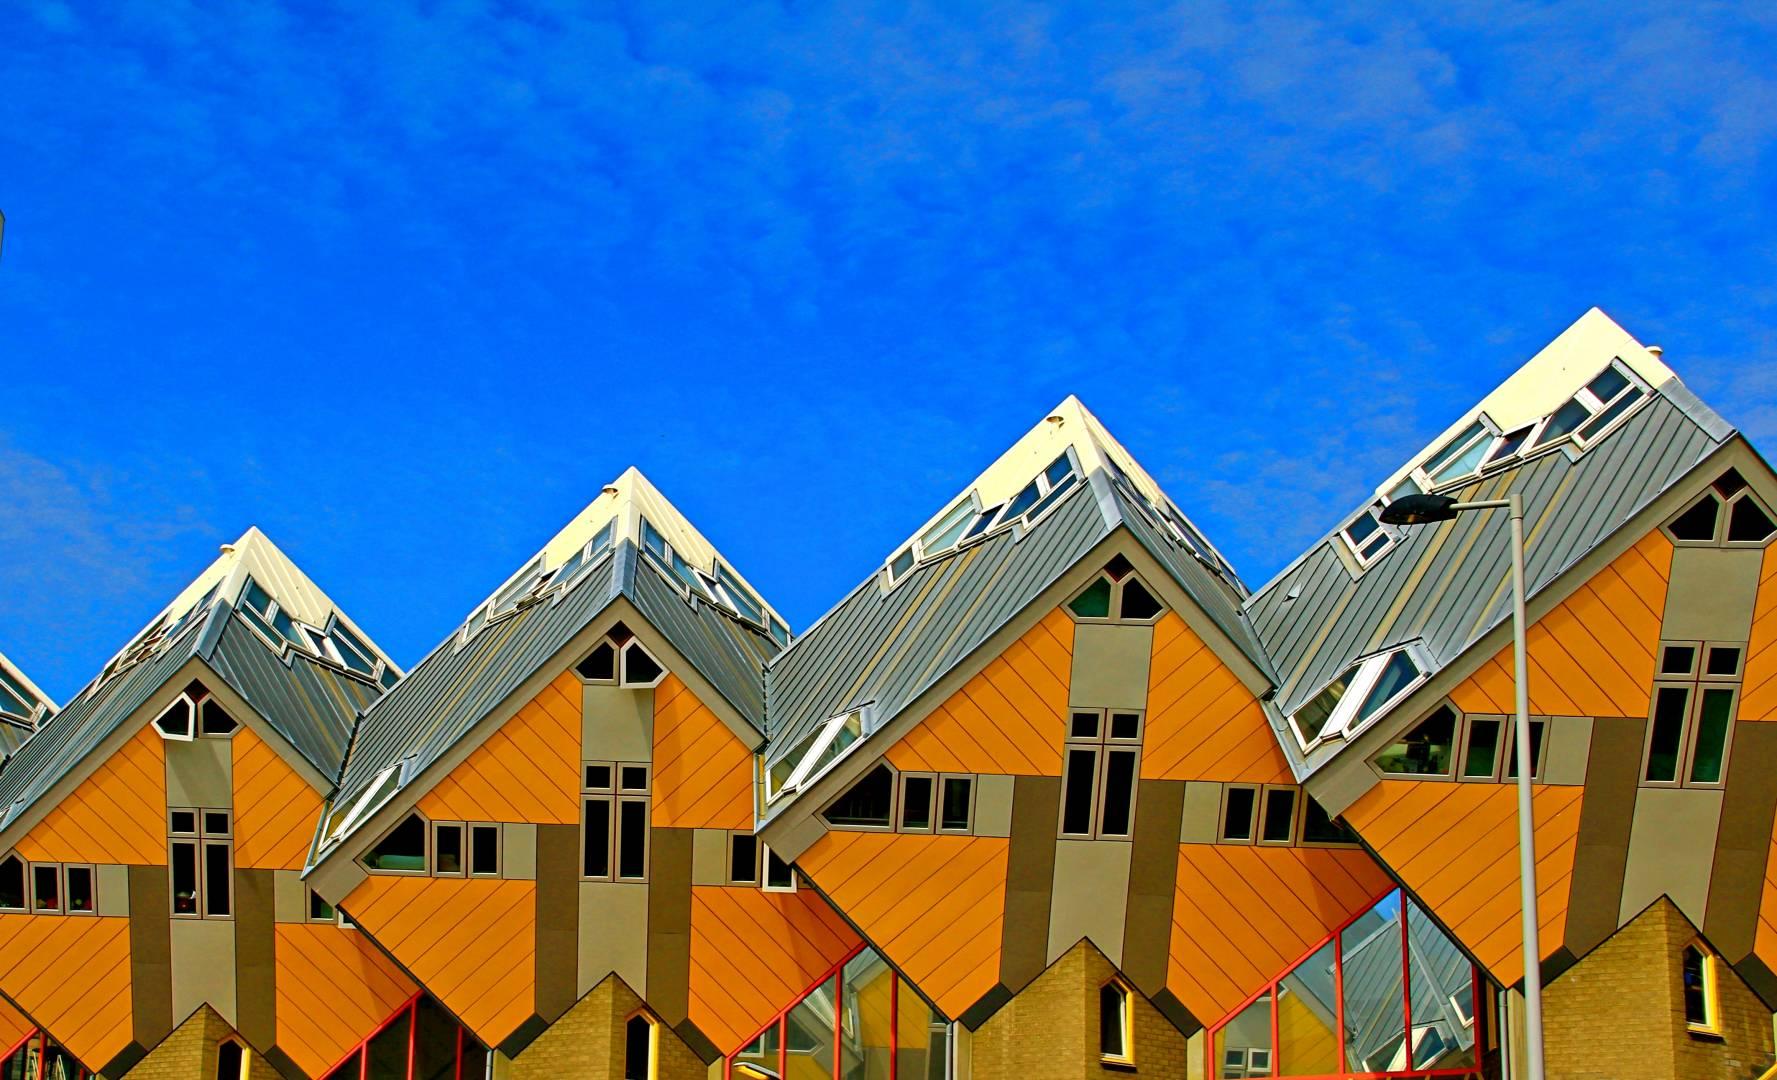 Holland Trip Photo Diary: Day 12 - Rotterdam